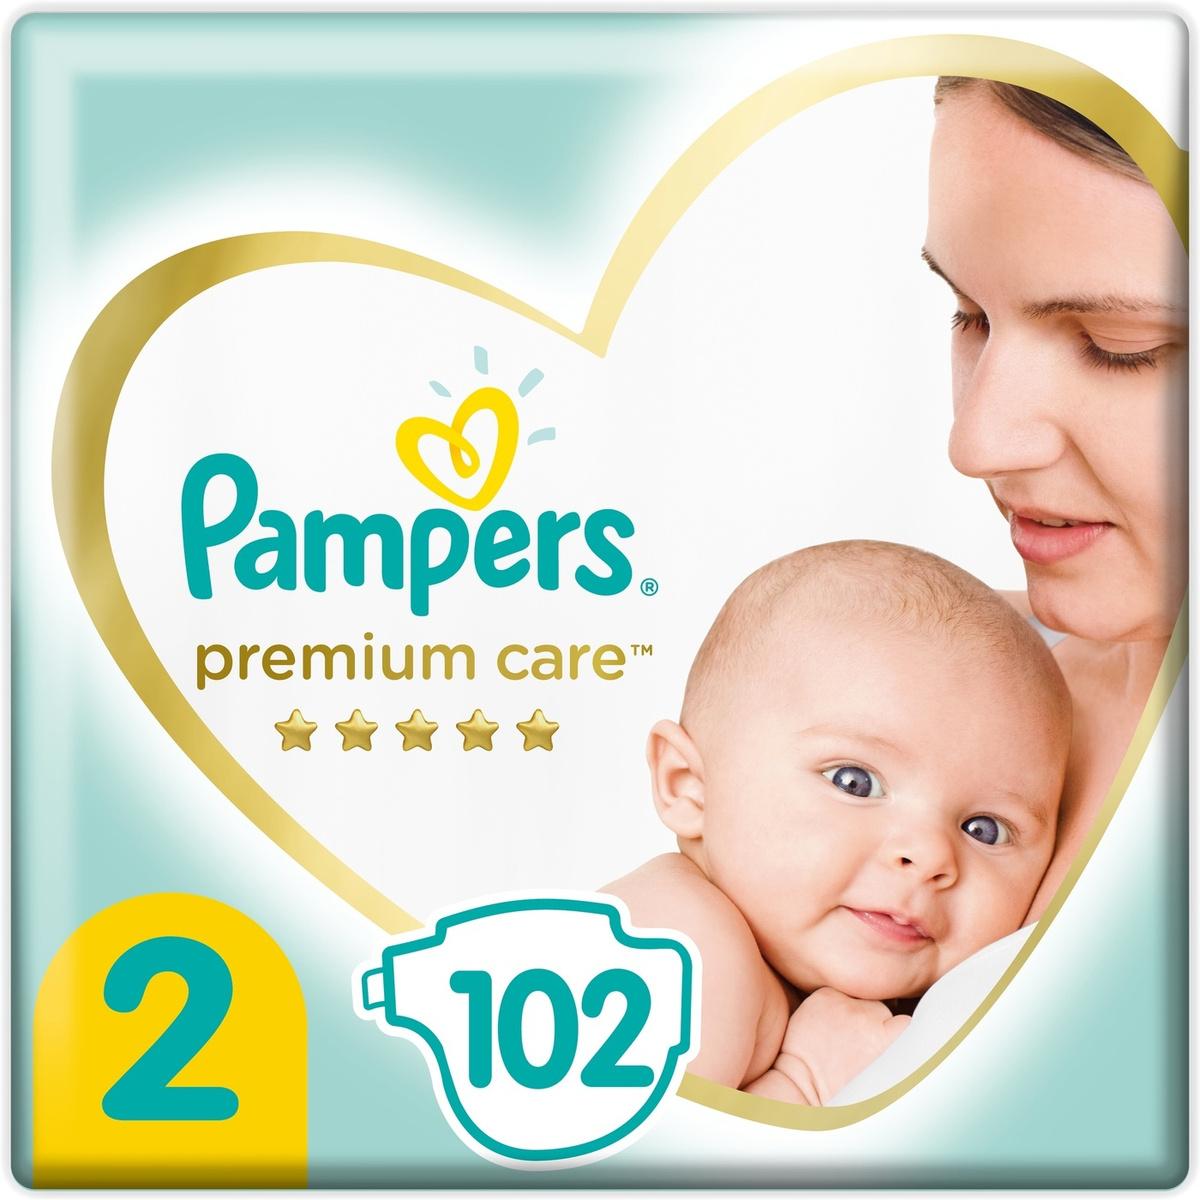 Pampers Подгузники Premium Care 4-8 кг 102 шт #1